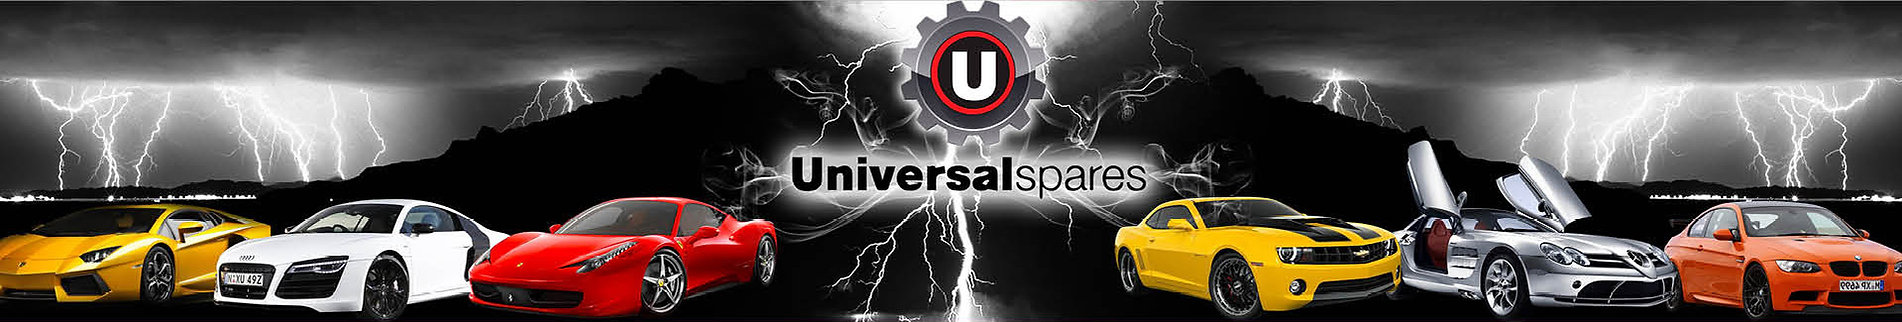 _0000_universalSpares-slideshow.jpg.jpg